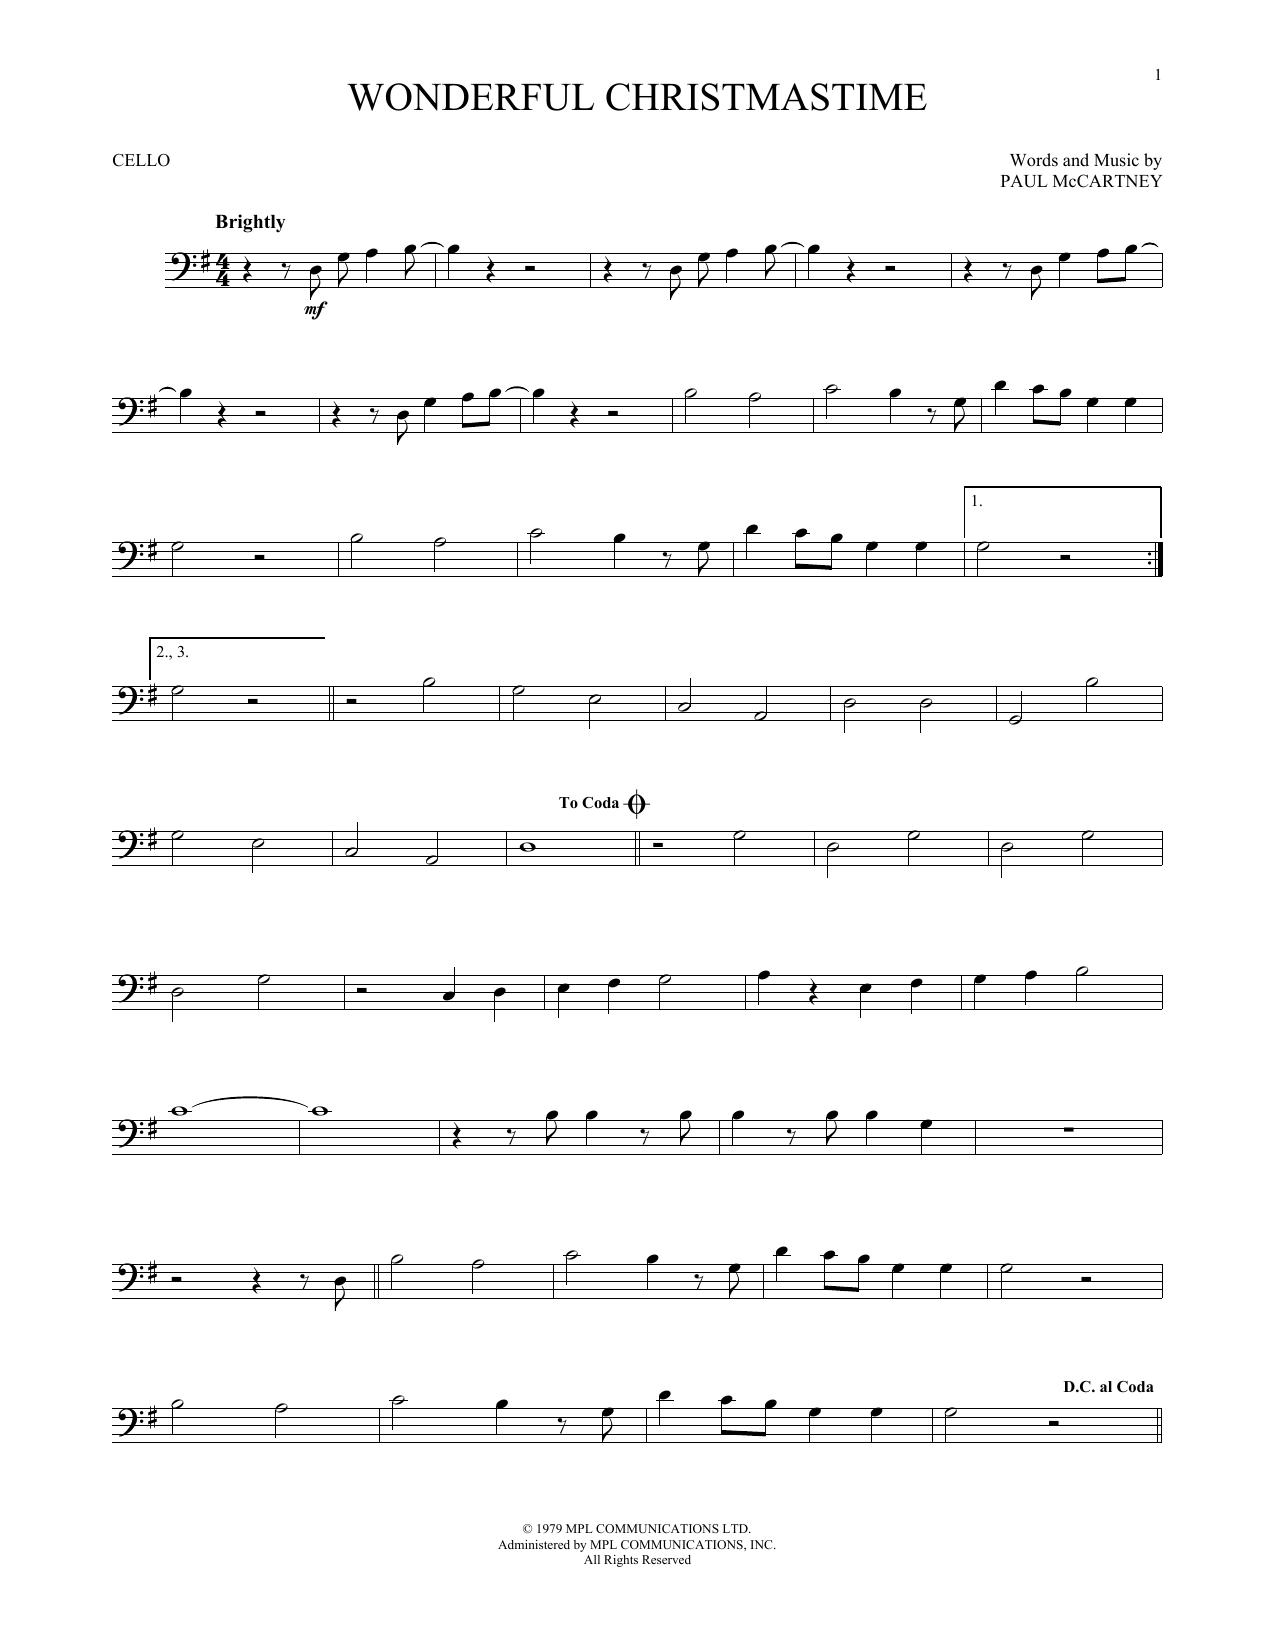 Wonderful Christmastime (Cello Solo)